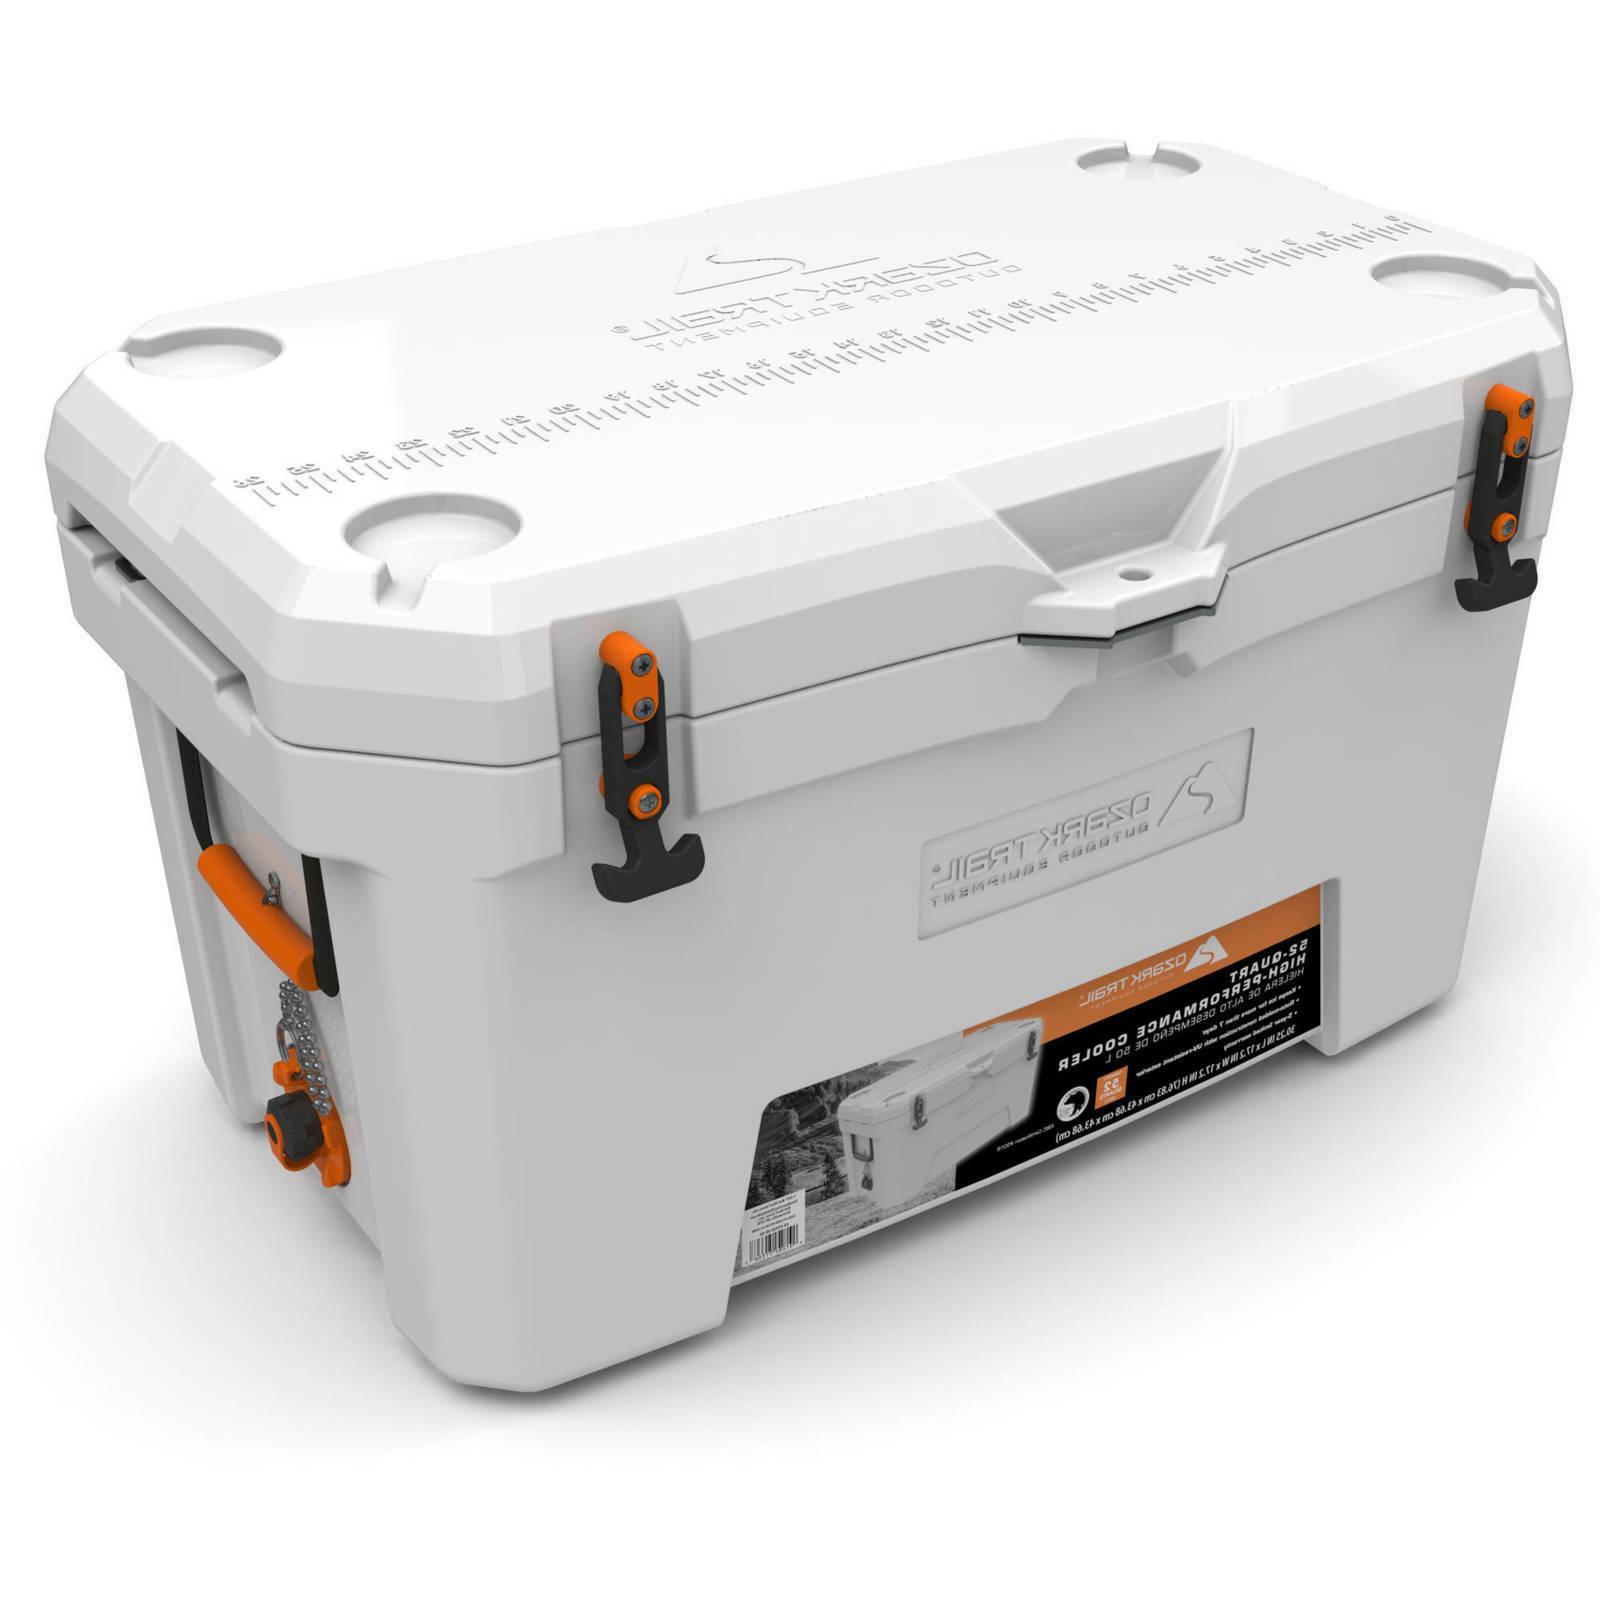 ozark trail 52 quart high performance cooler